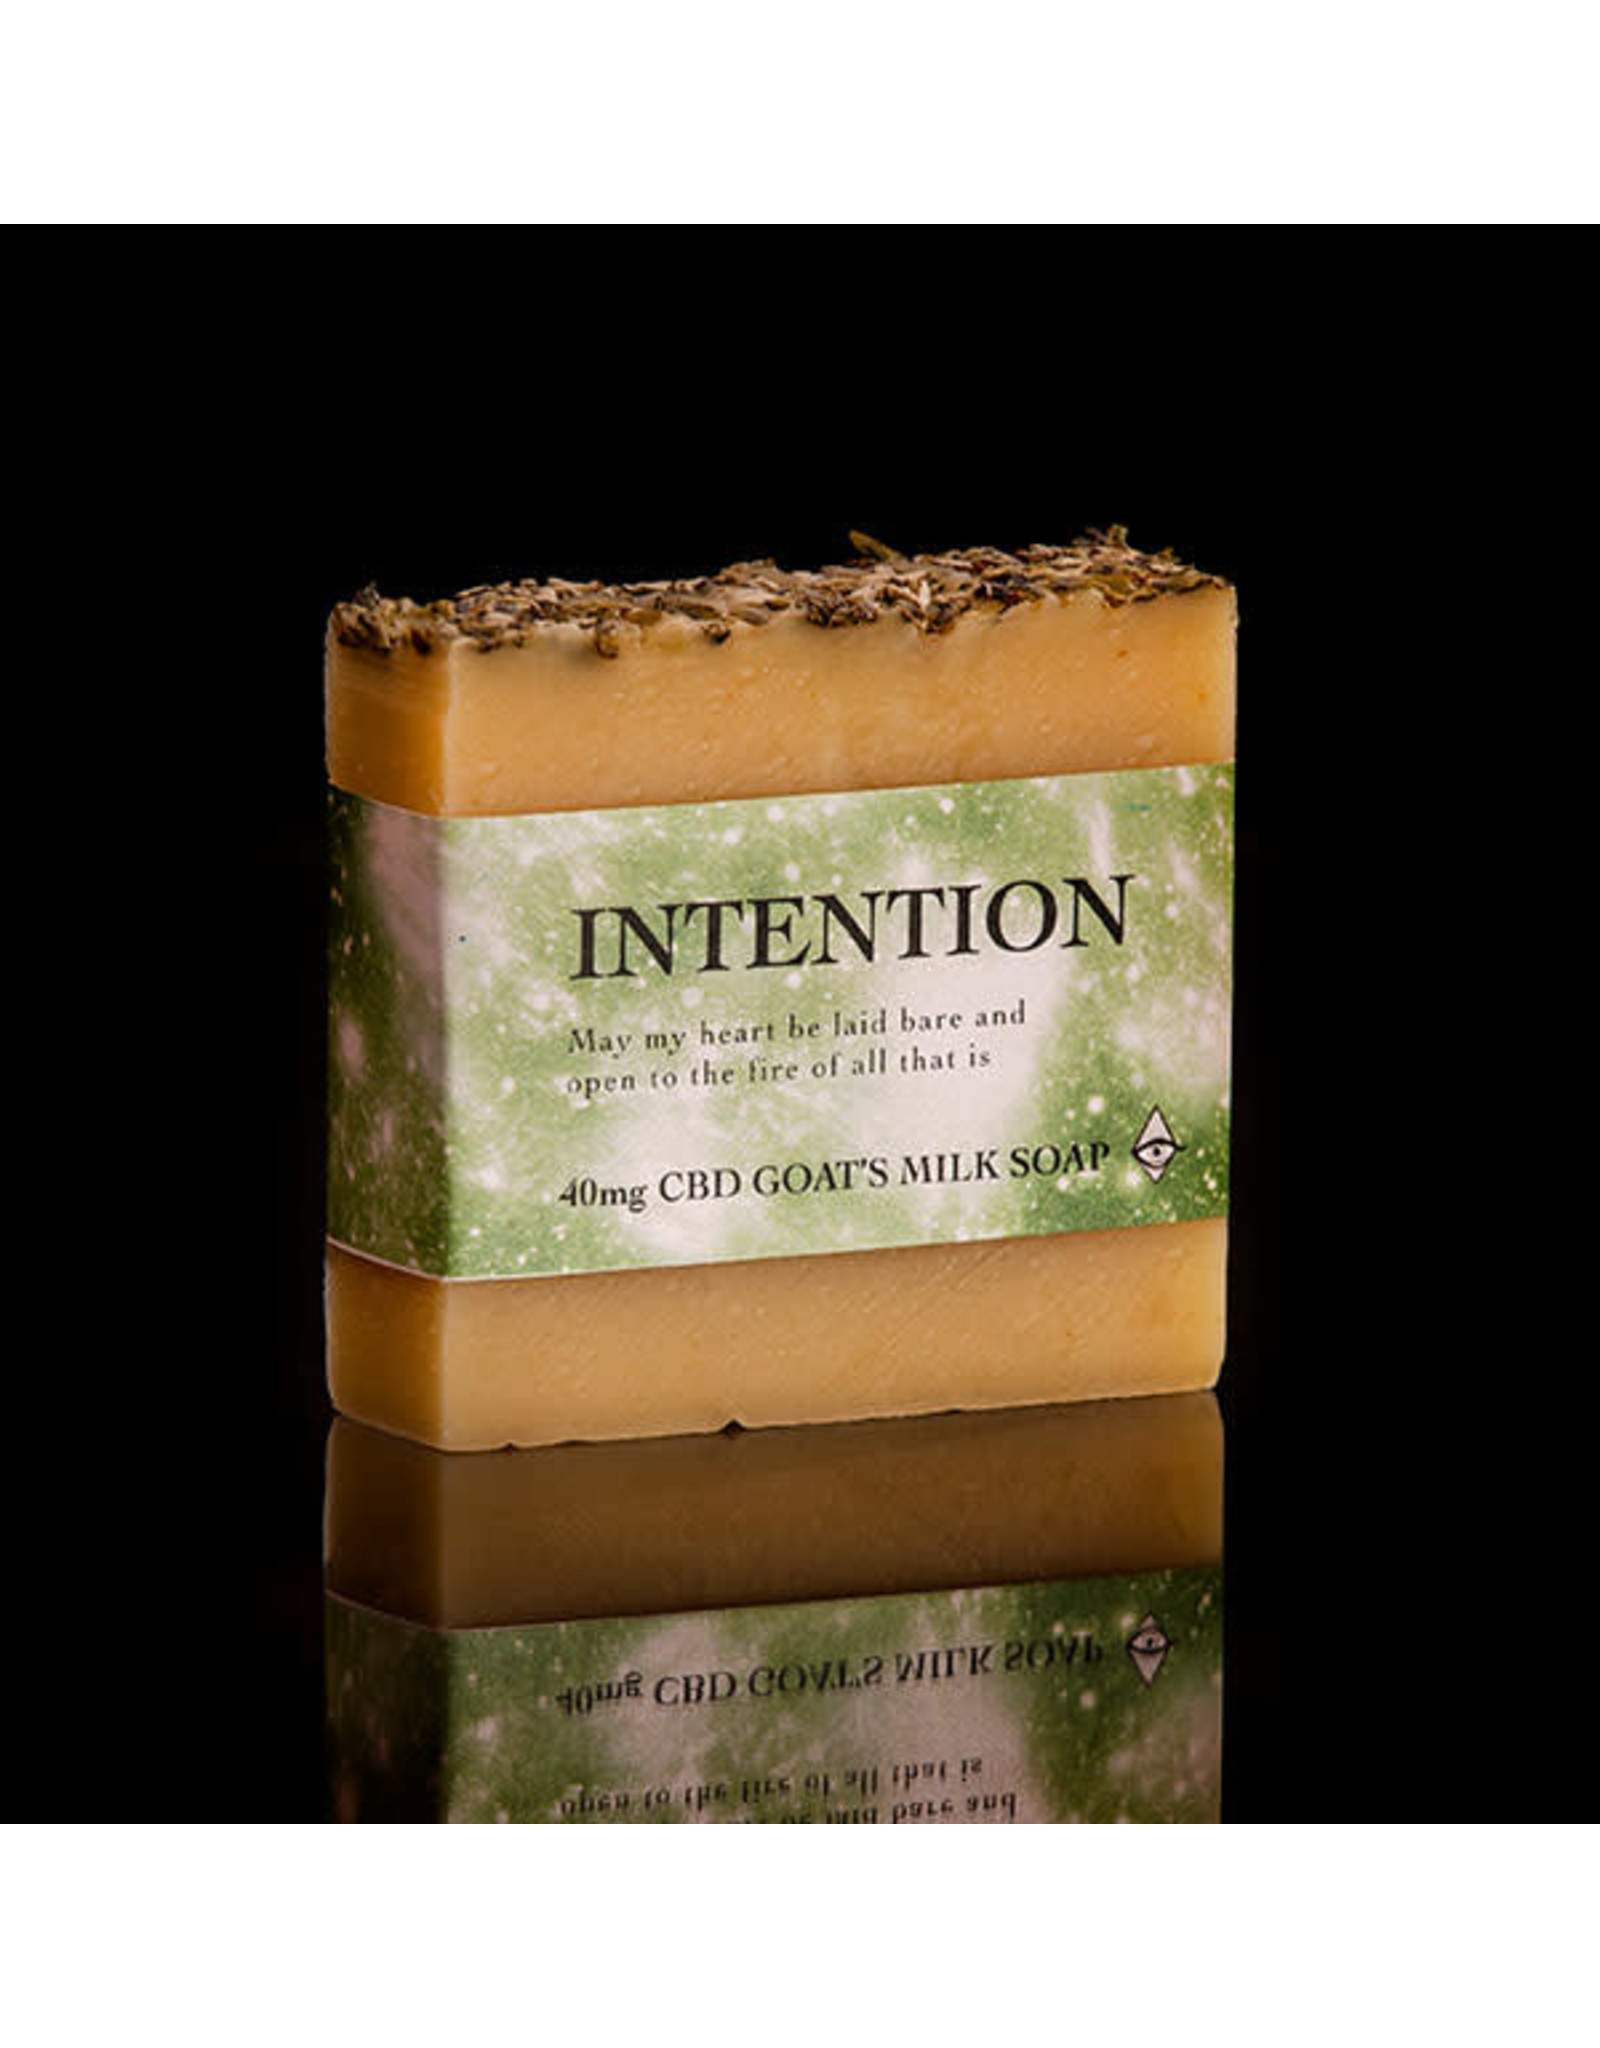 Intention CBD Soap - 40 mg